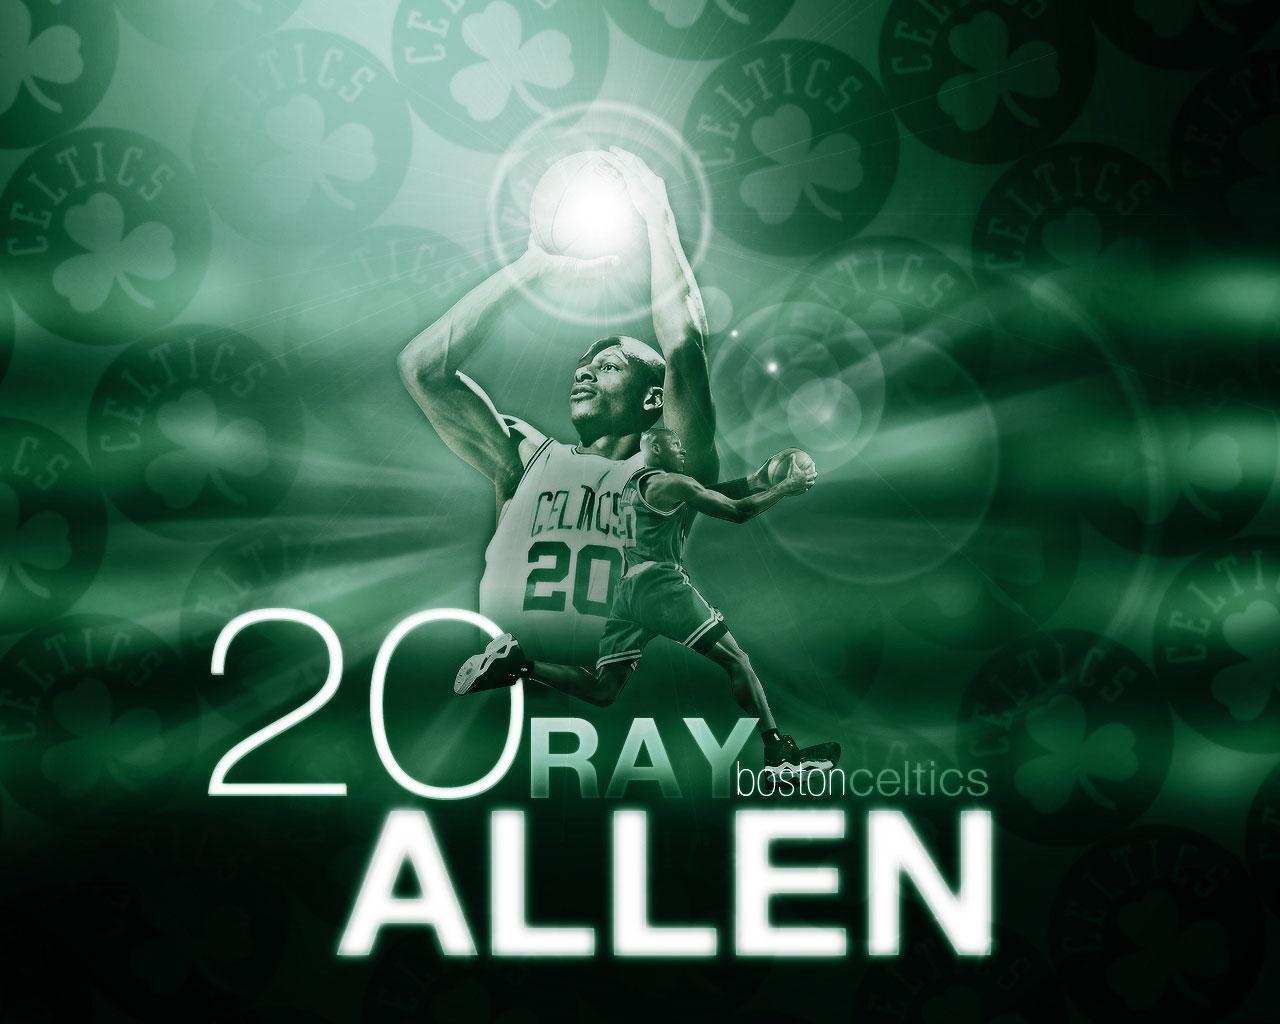 Ray Allen Celtics No. 20 Wallpaper